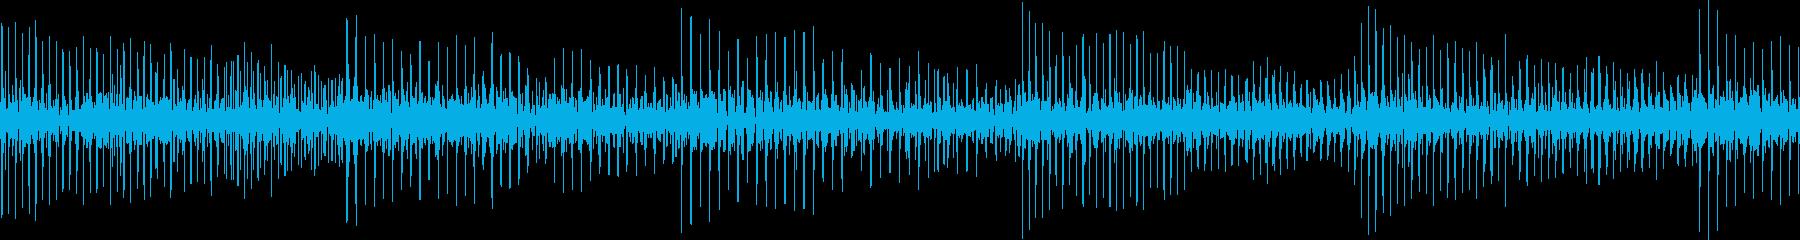 AMGアナログFX12の再生済みの波形